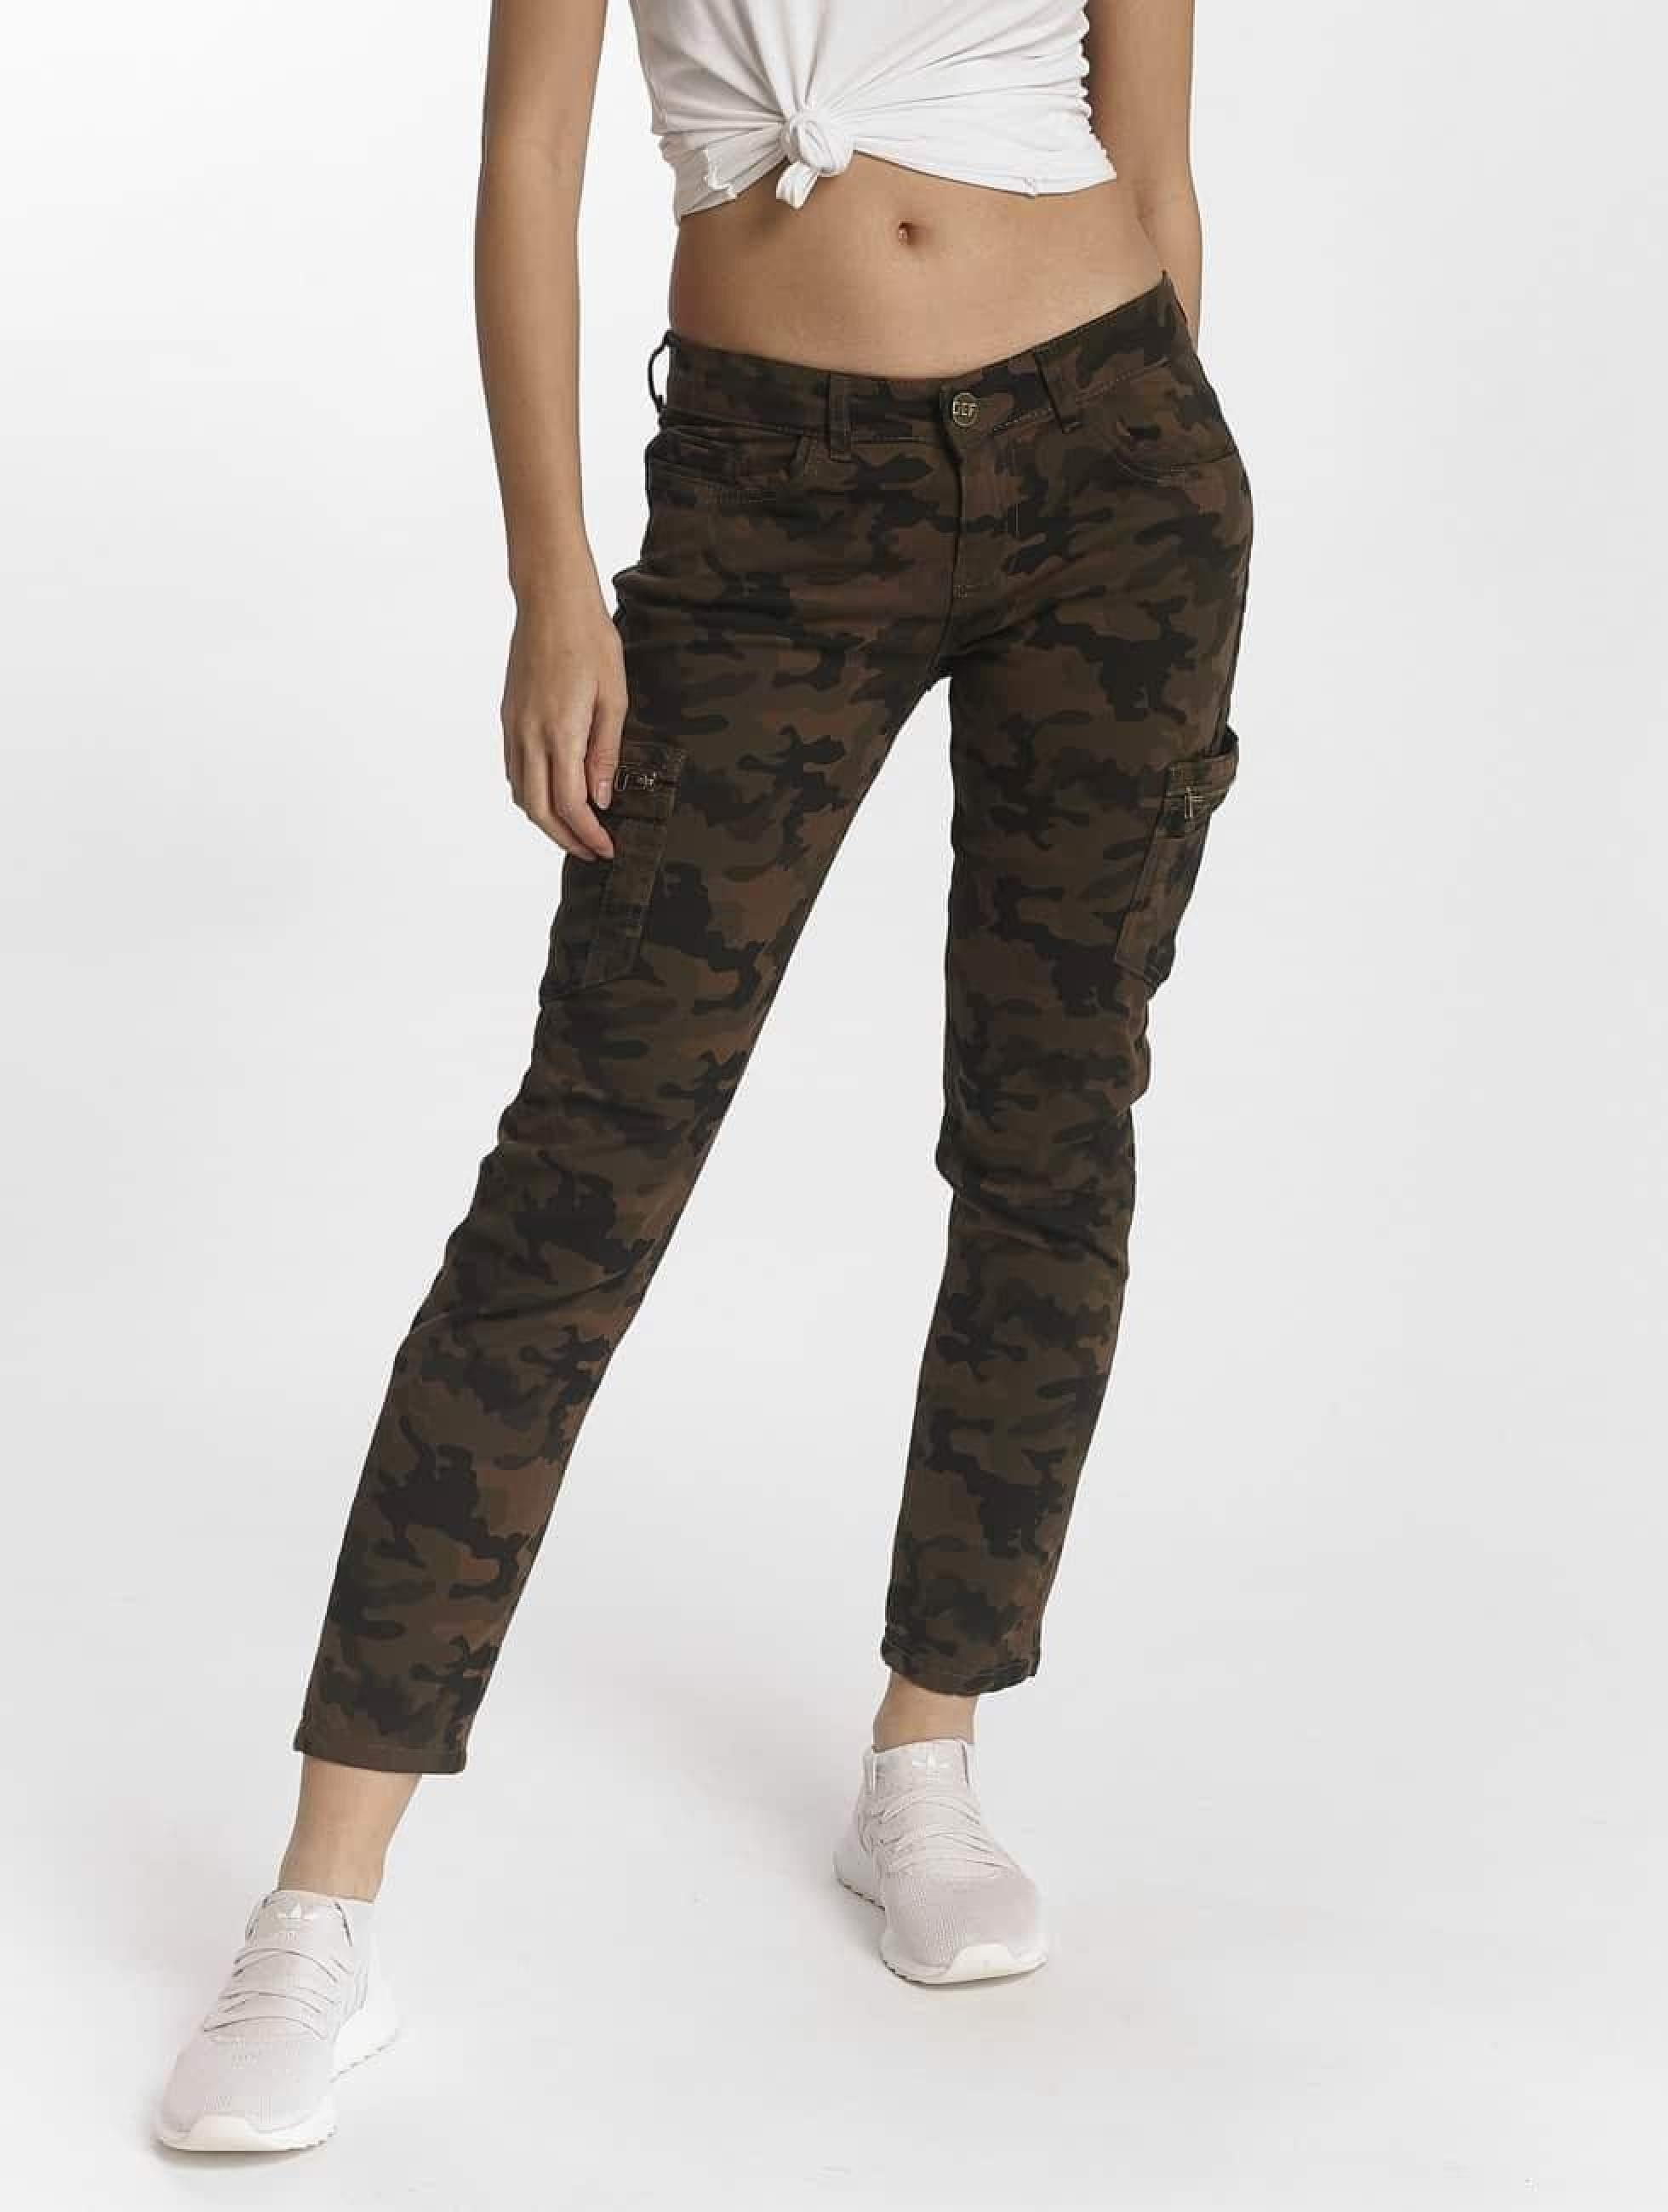 DEF / Boyfriend Jeans Manaboom in camouflage XS